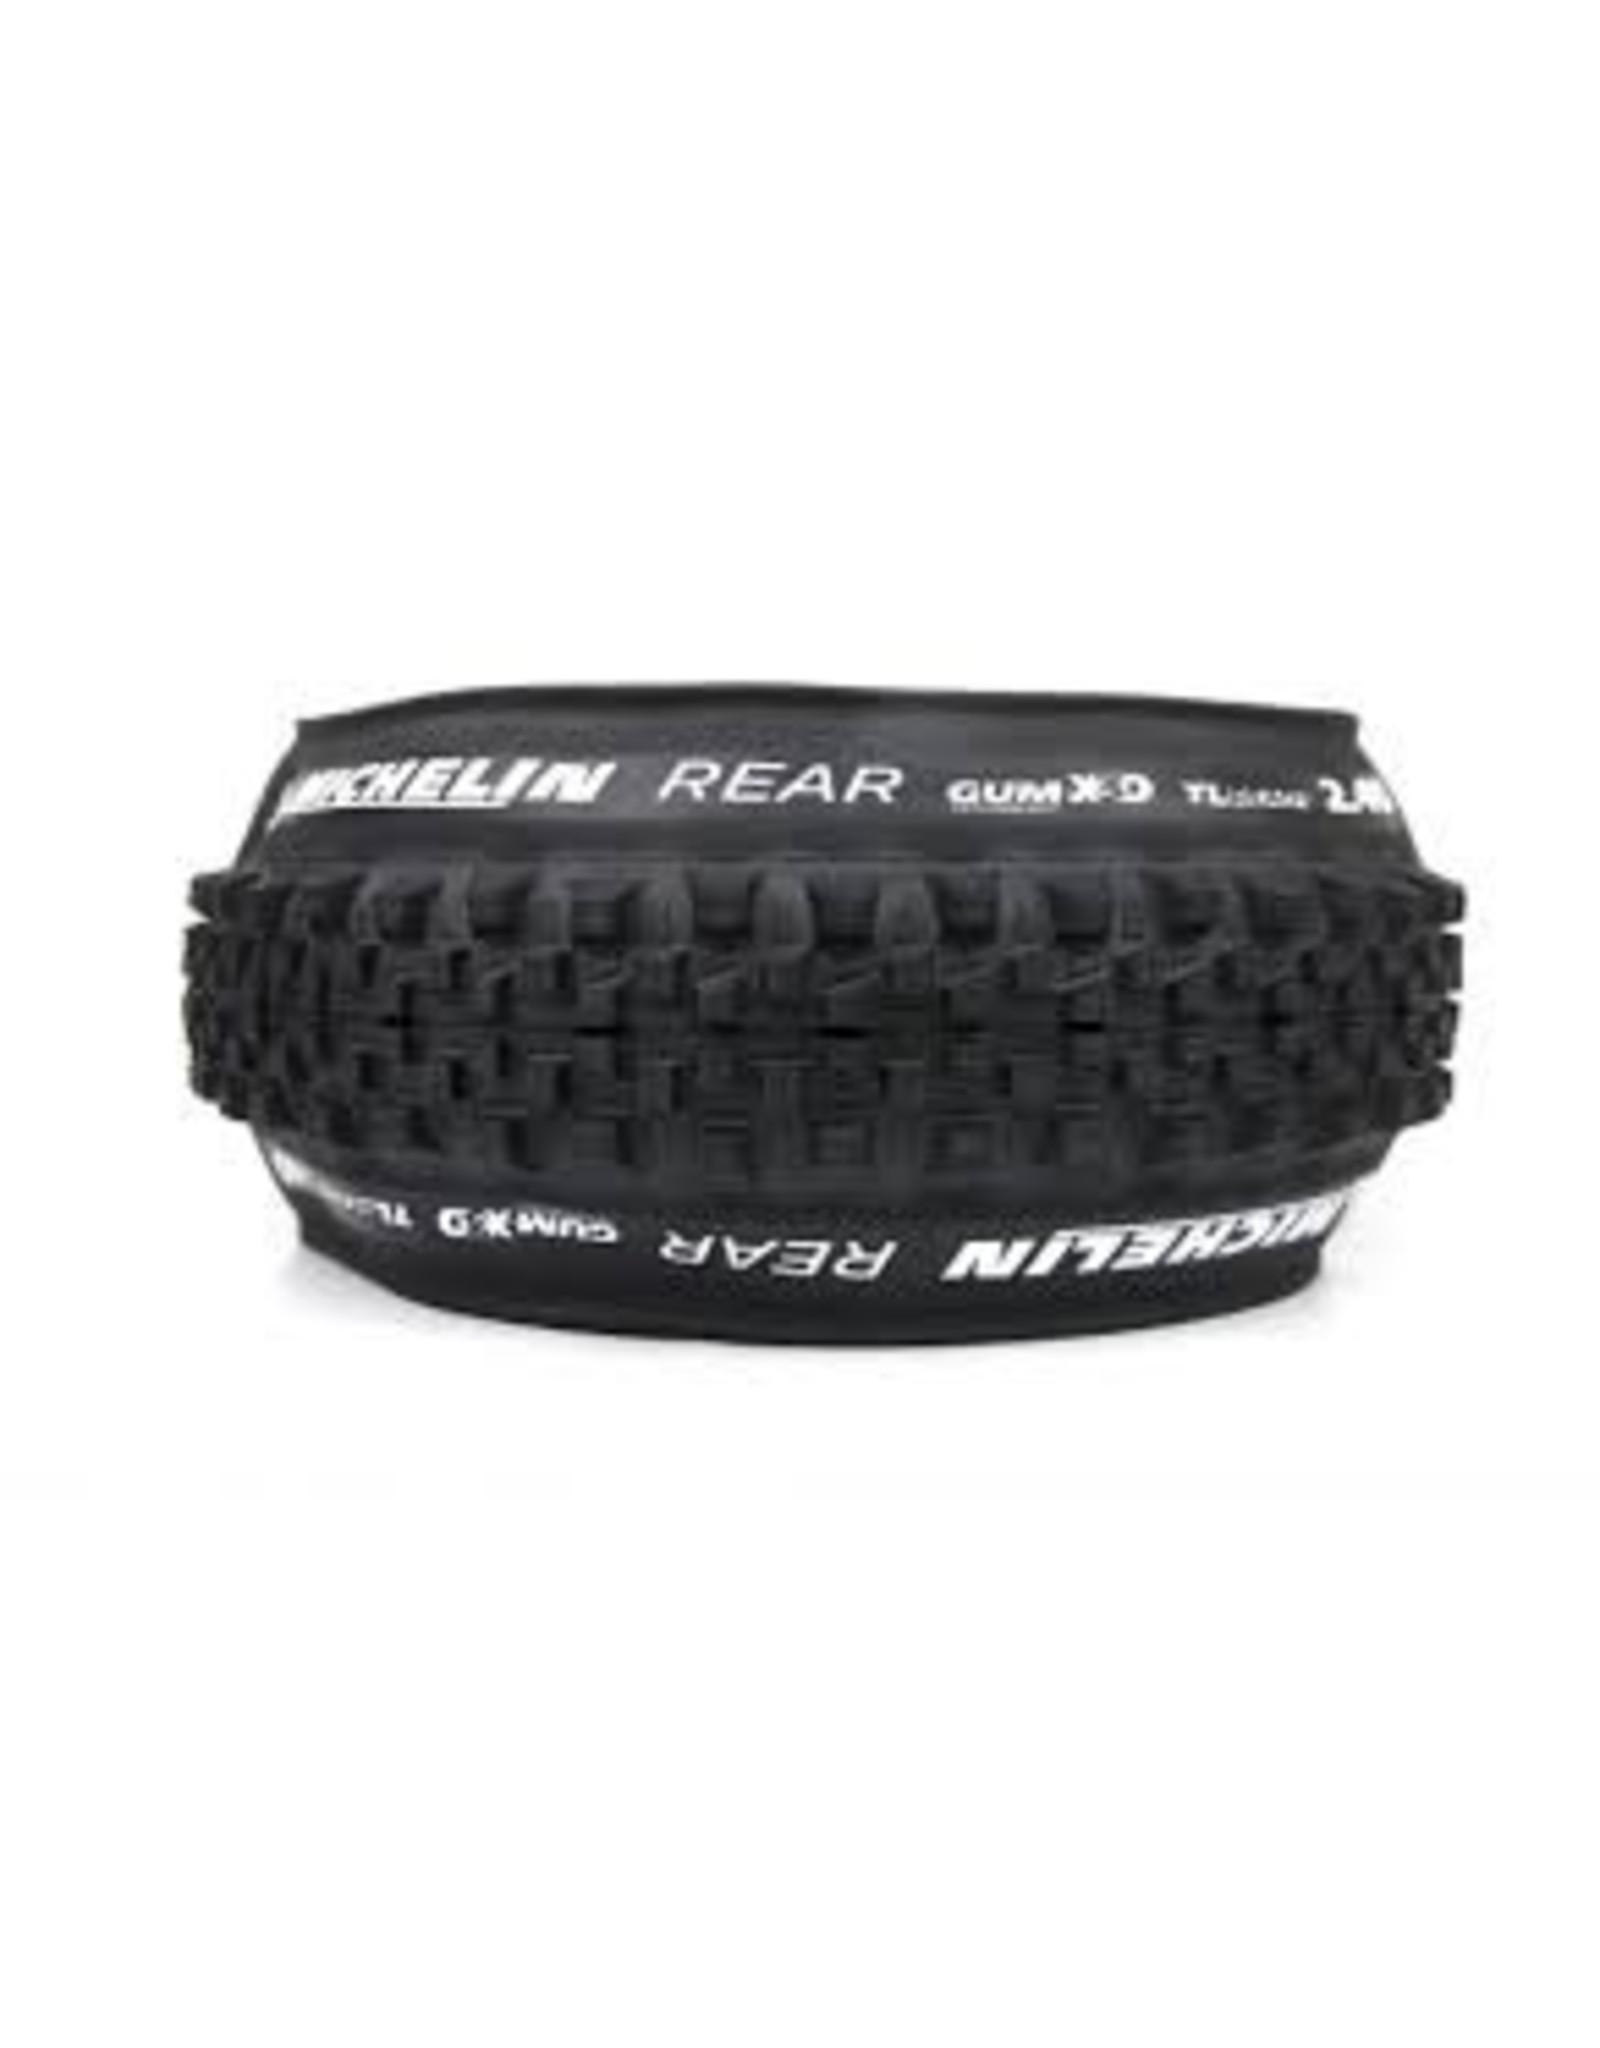 Michelin 29x2.4 Wild Enduro Rear Tire, Fold, GUM-X GravityShield